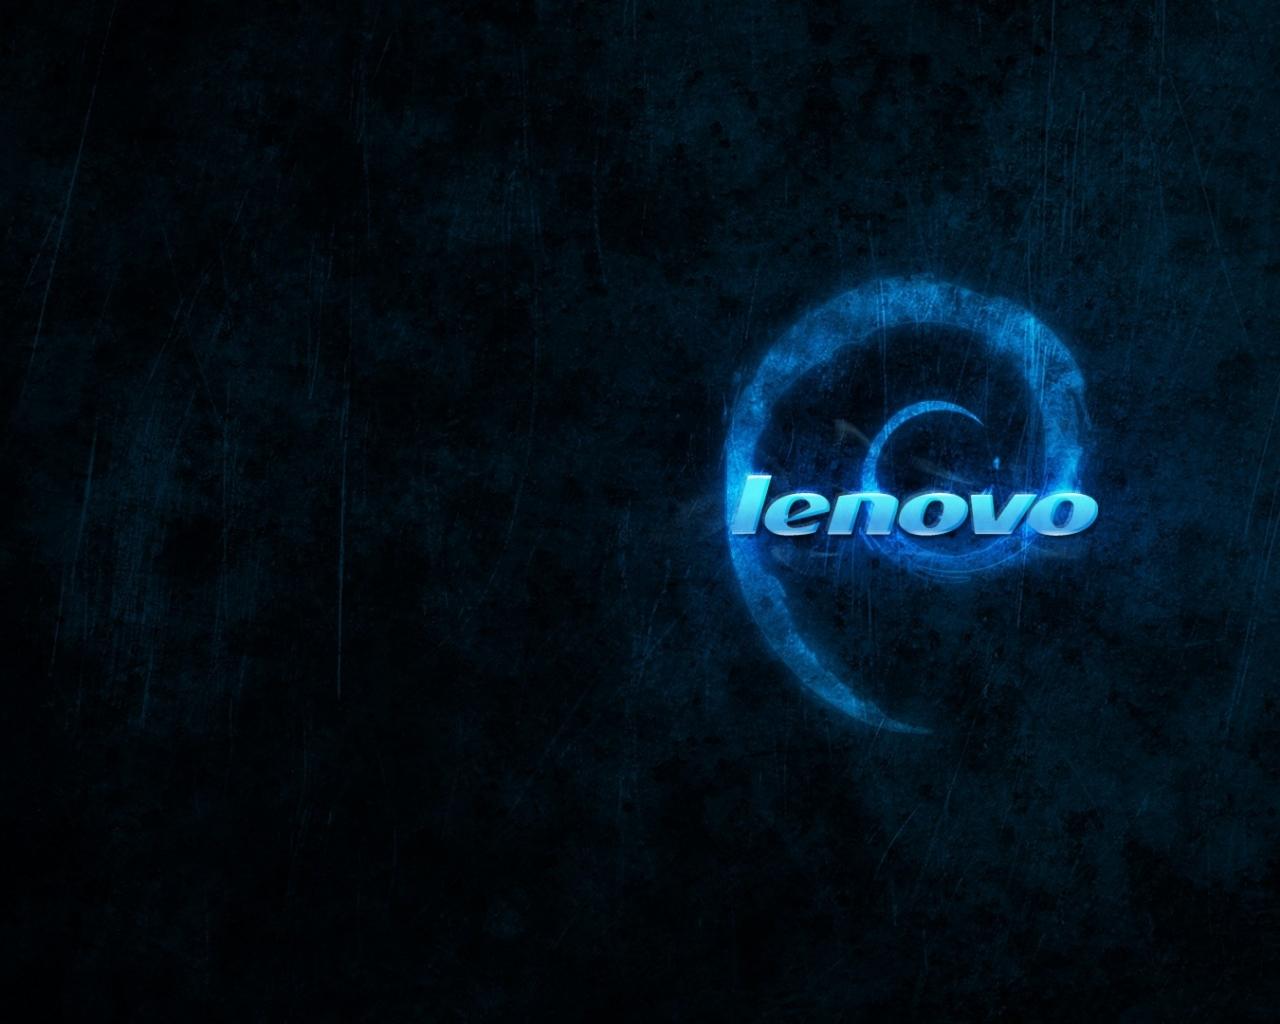 Download Lenovo Wallpaper [1280x1024] | 50+ Lenovo Wallpaper